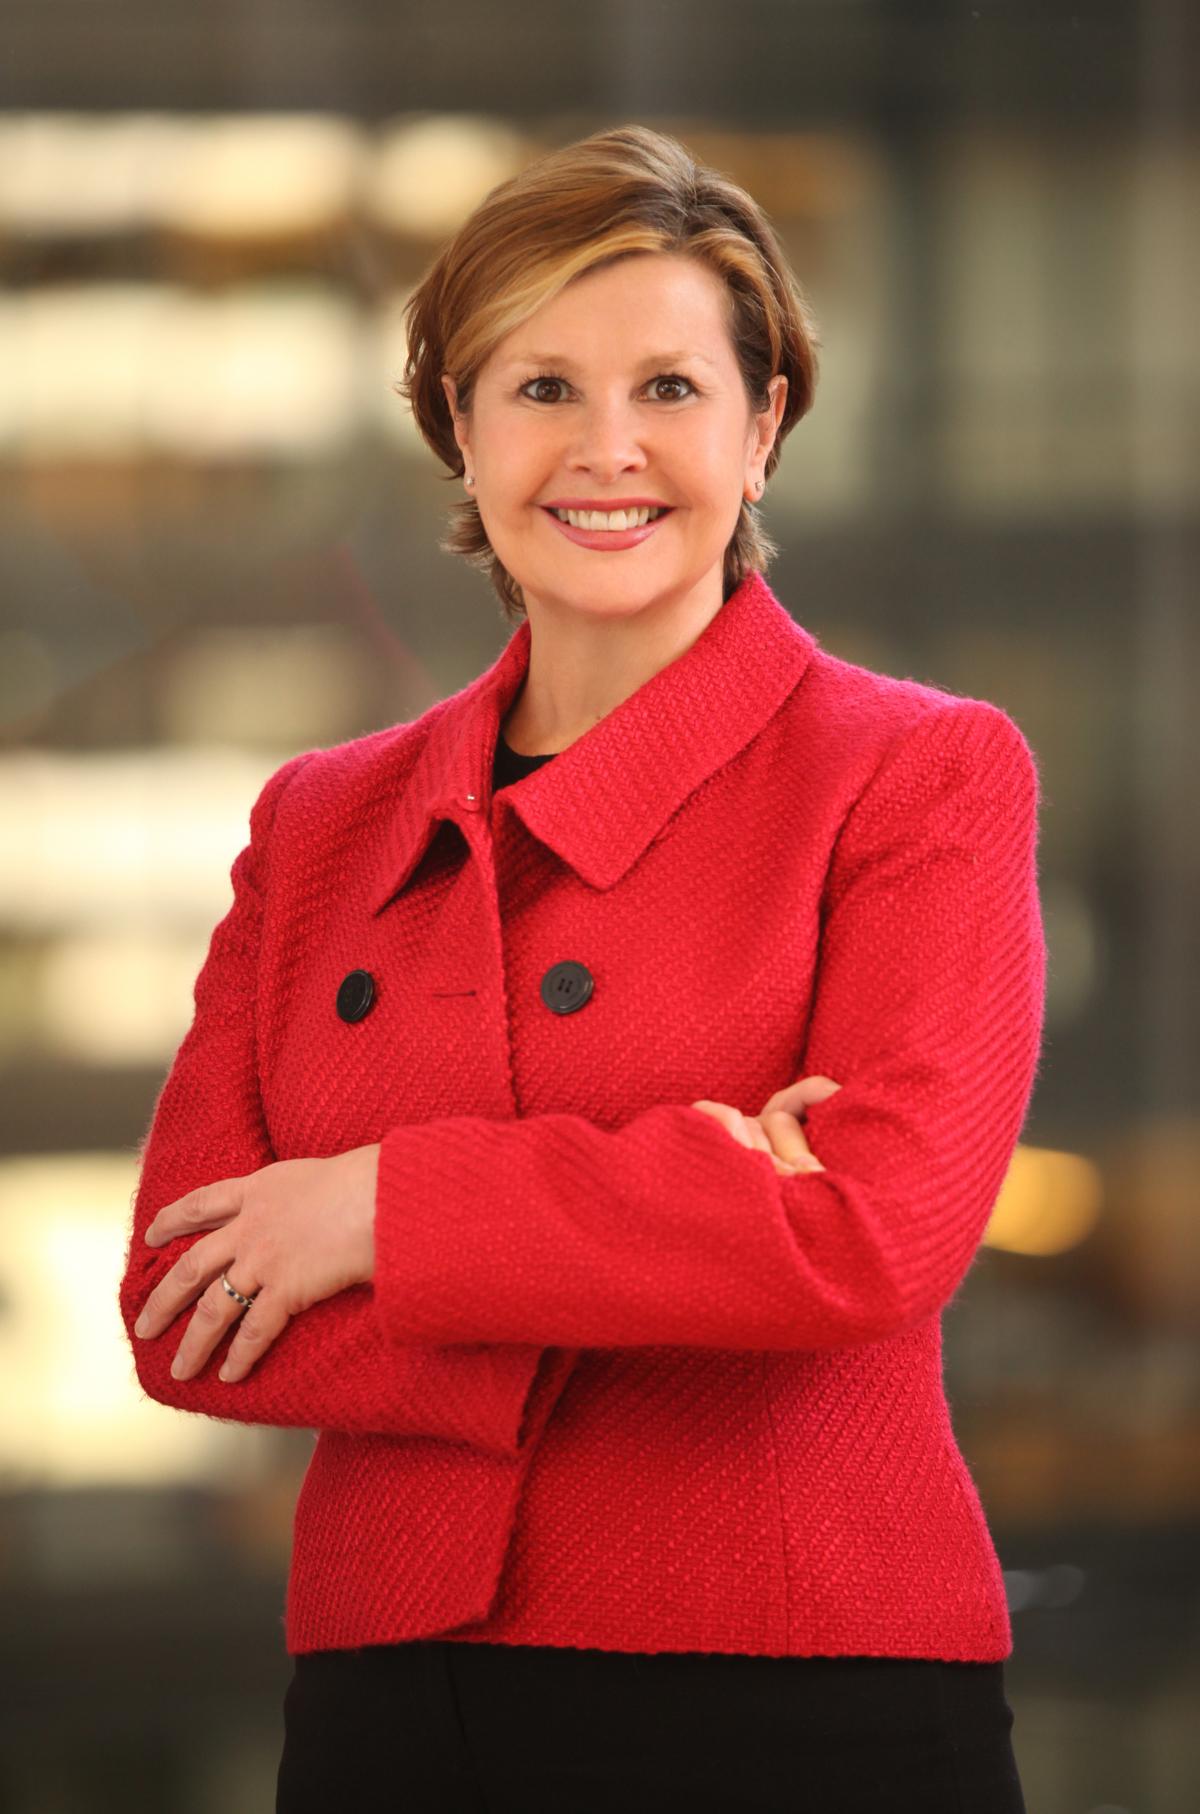 Lauren Vela , Senior Director at Pacific Business Group on Health (PBGH)